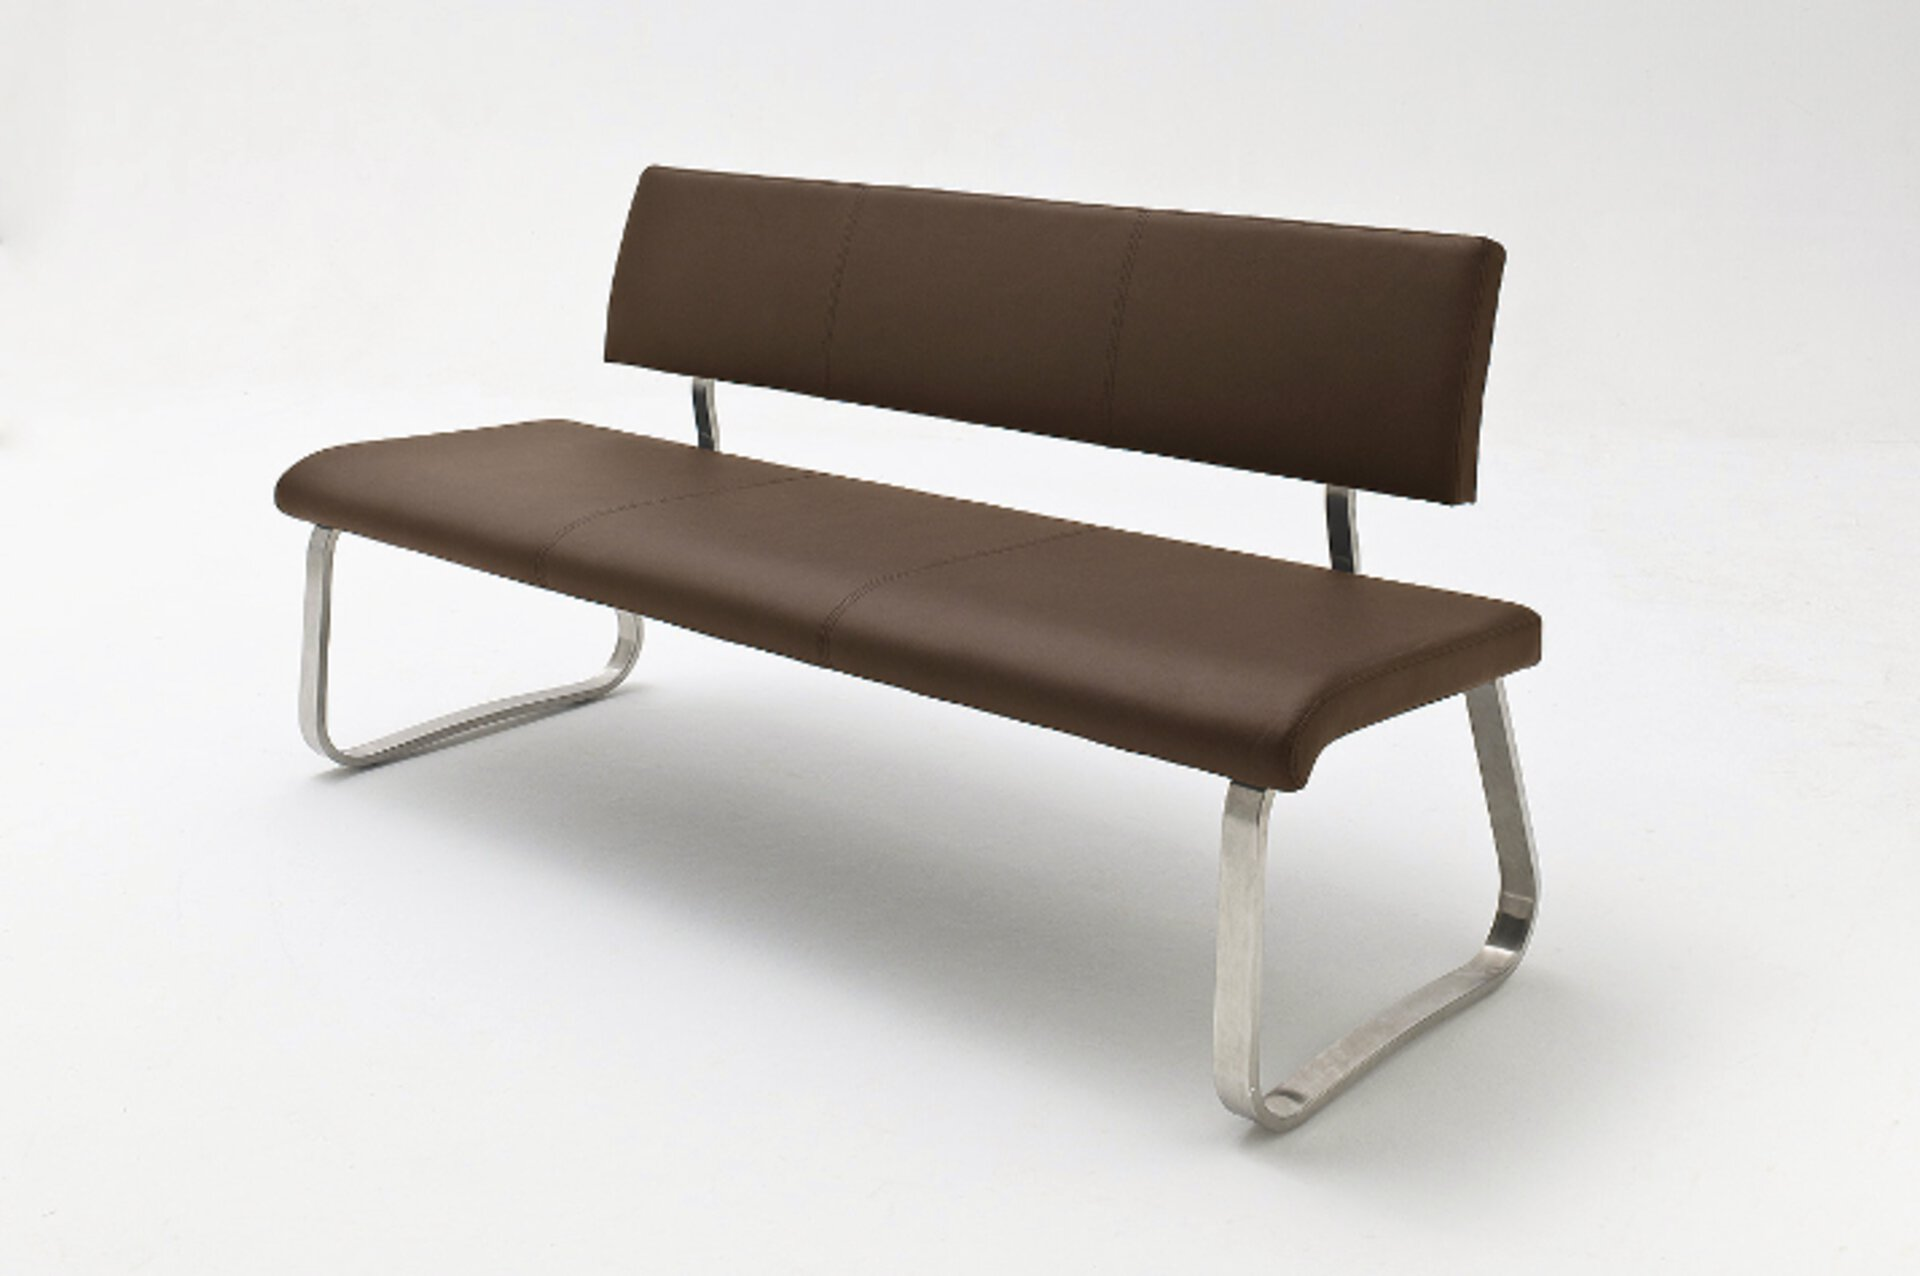 Sitzbank ARCO MCA furniture Textil mehrfarbig 59 x 86 x 155 cm